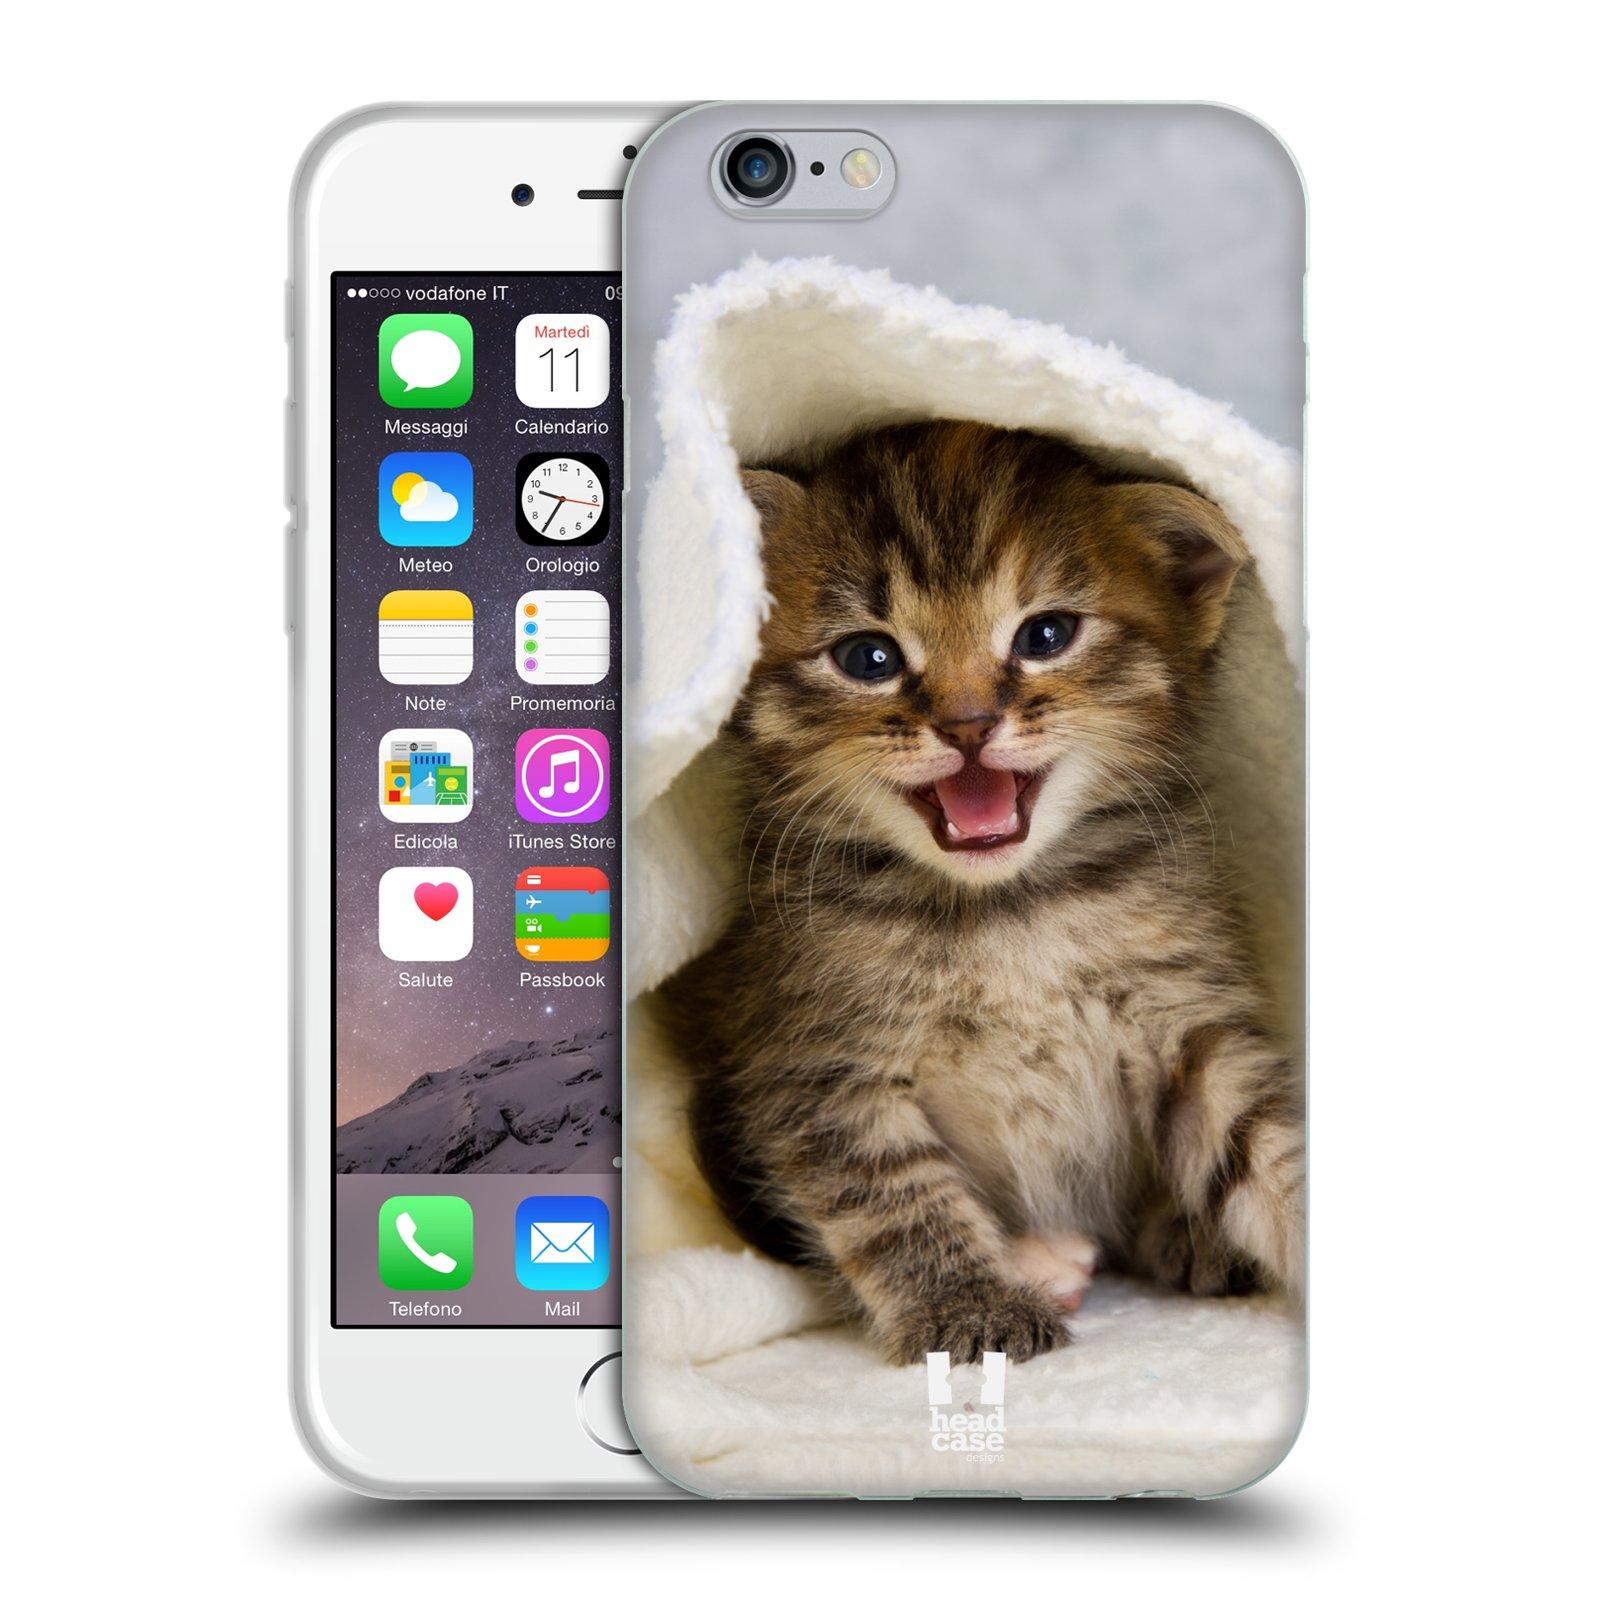 HEAD CASE silikonový obal na mobil Apple Iphone 6/6S vzor Kočičky koťata foto kotě v ručníku